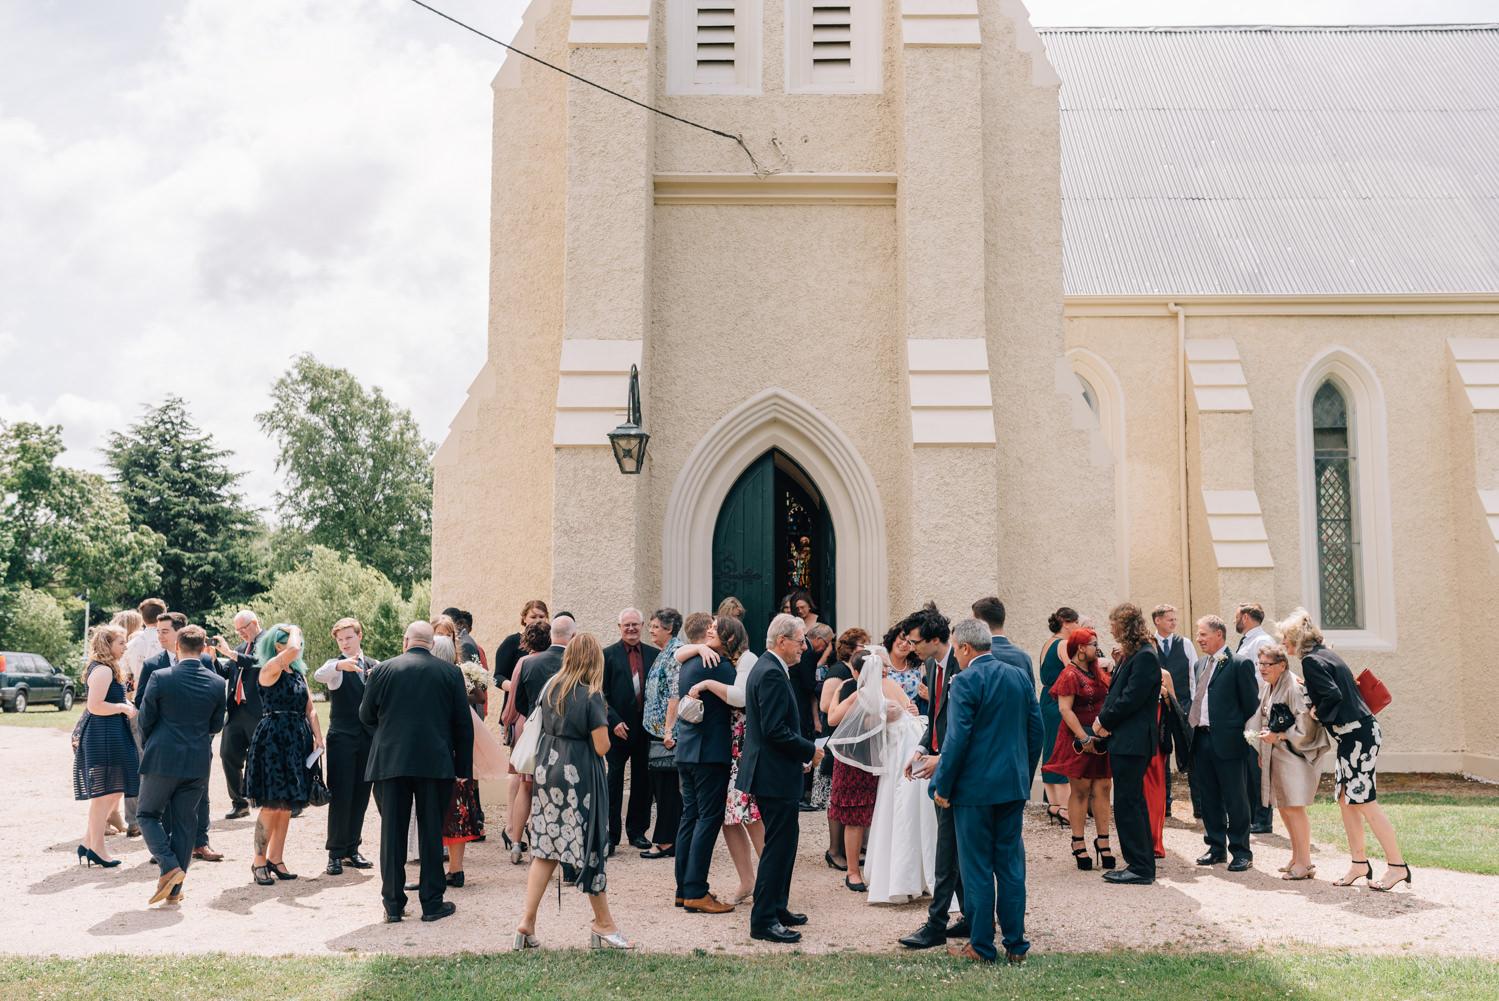 Josef-Chromy-Wedding-Photographer-41.jpg